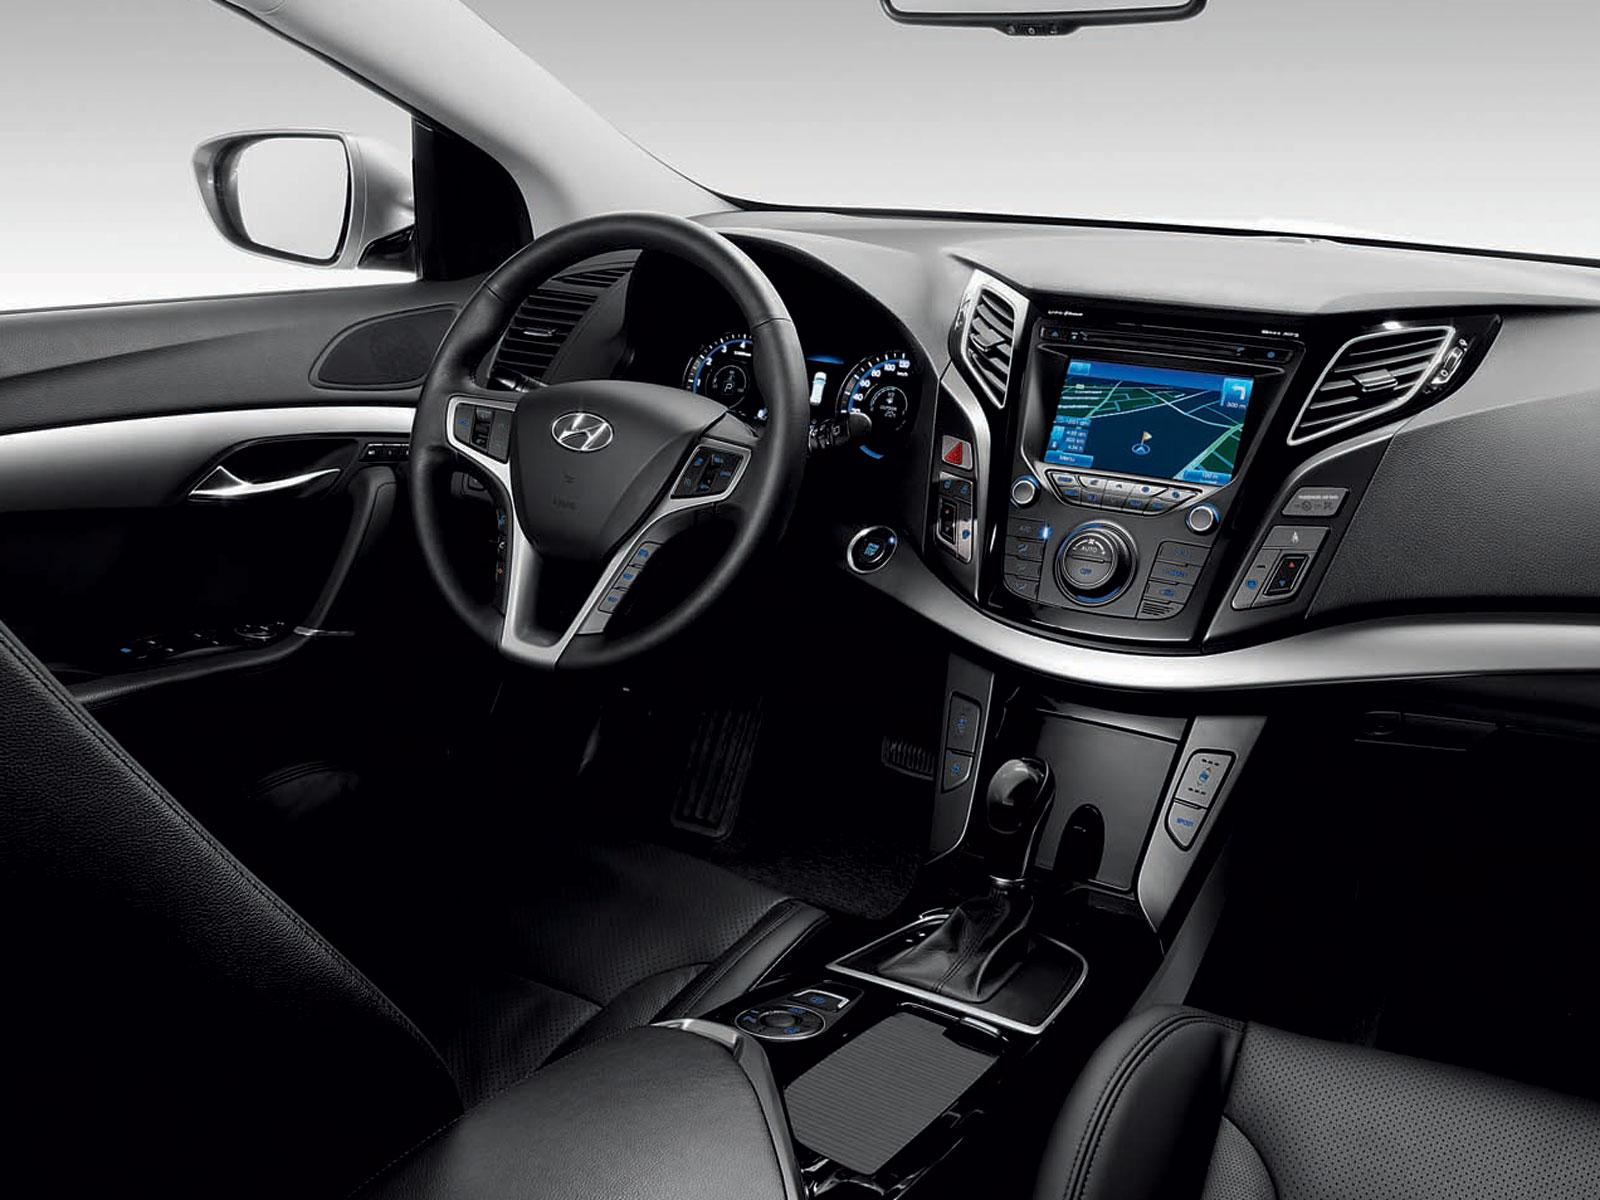 2012 hyundai i40 limousine autoguru. Black Bedroom Furniture Sets. Home Design Ideas